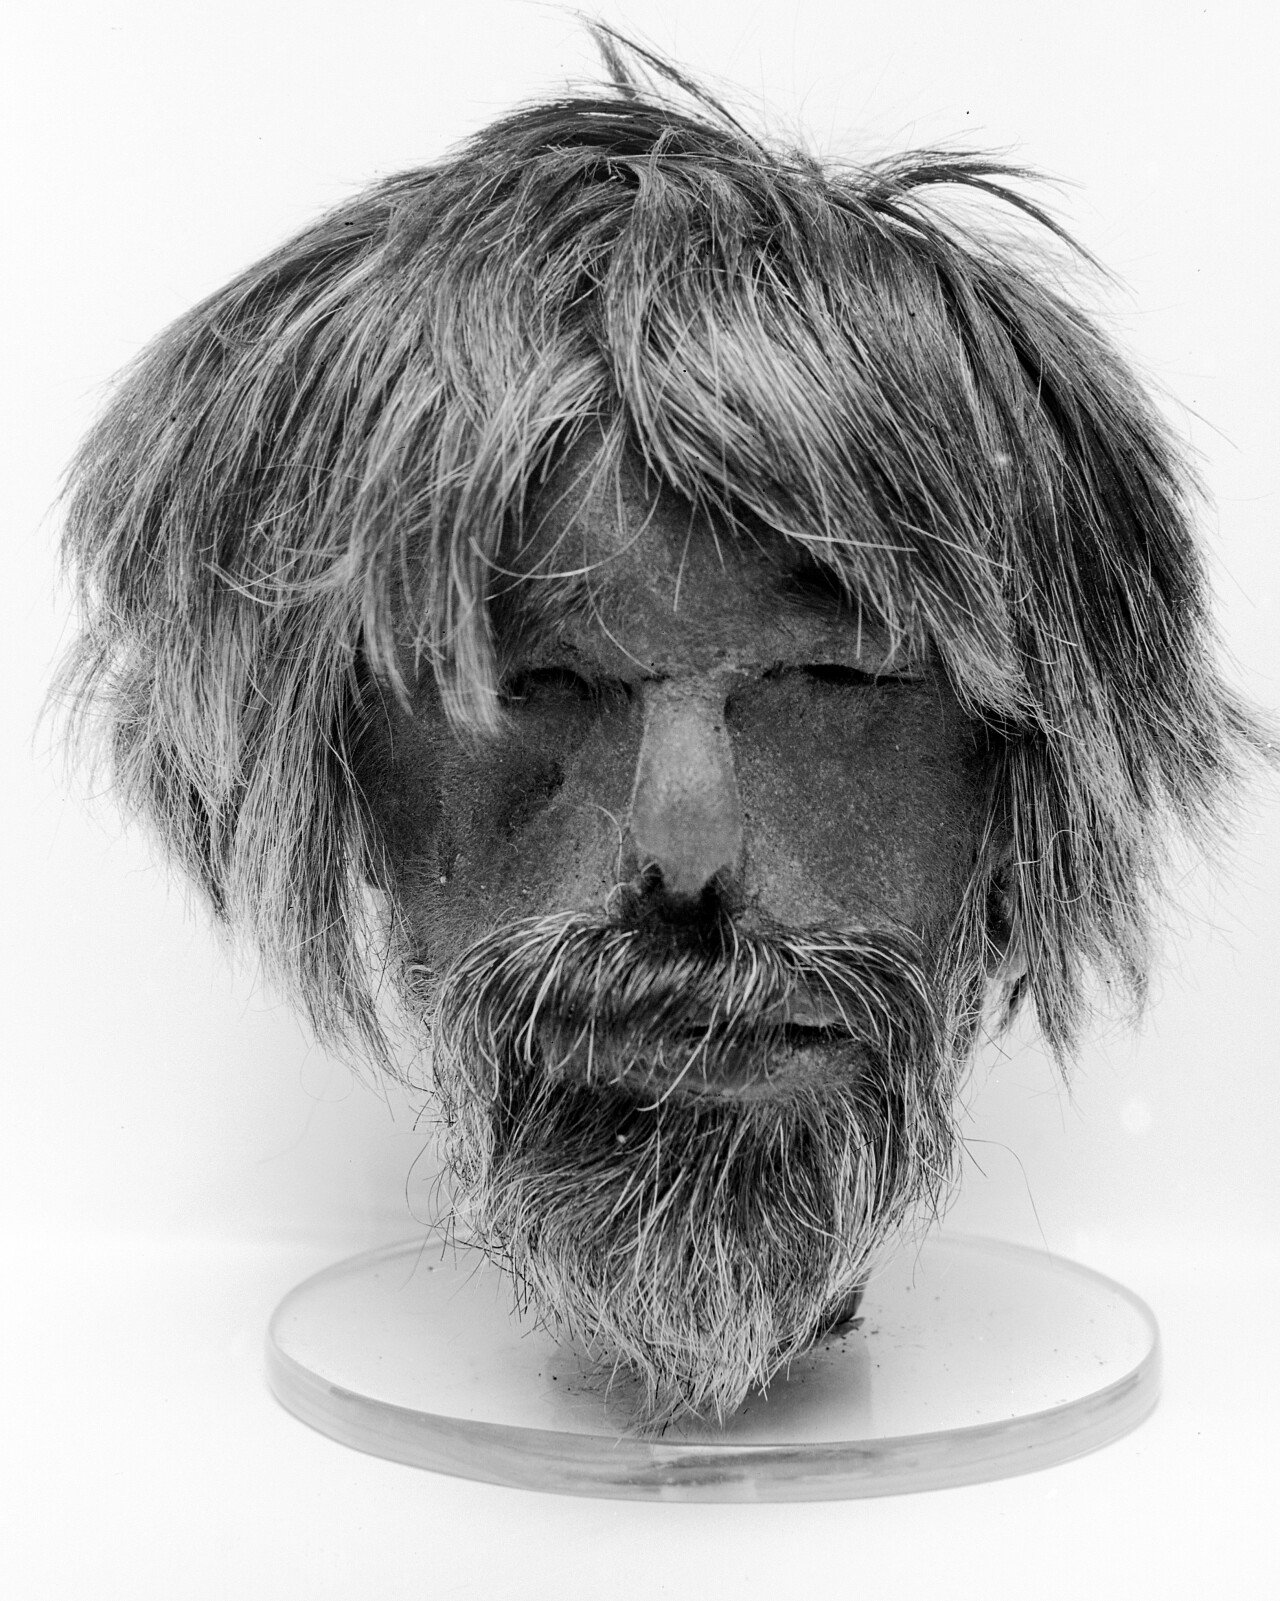 A_shrunken_head_Wellcome_M0000158.jpg 약혐) 시체의 머리를 방부처리해서 기념품으로 보관하는 풍습.jpg